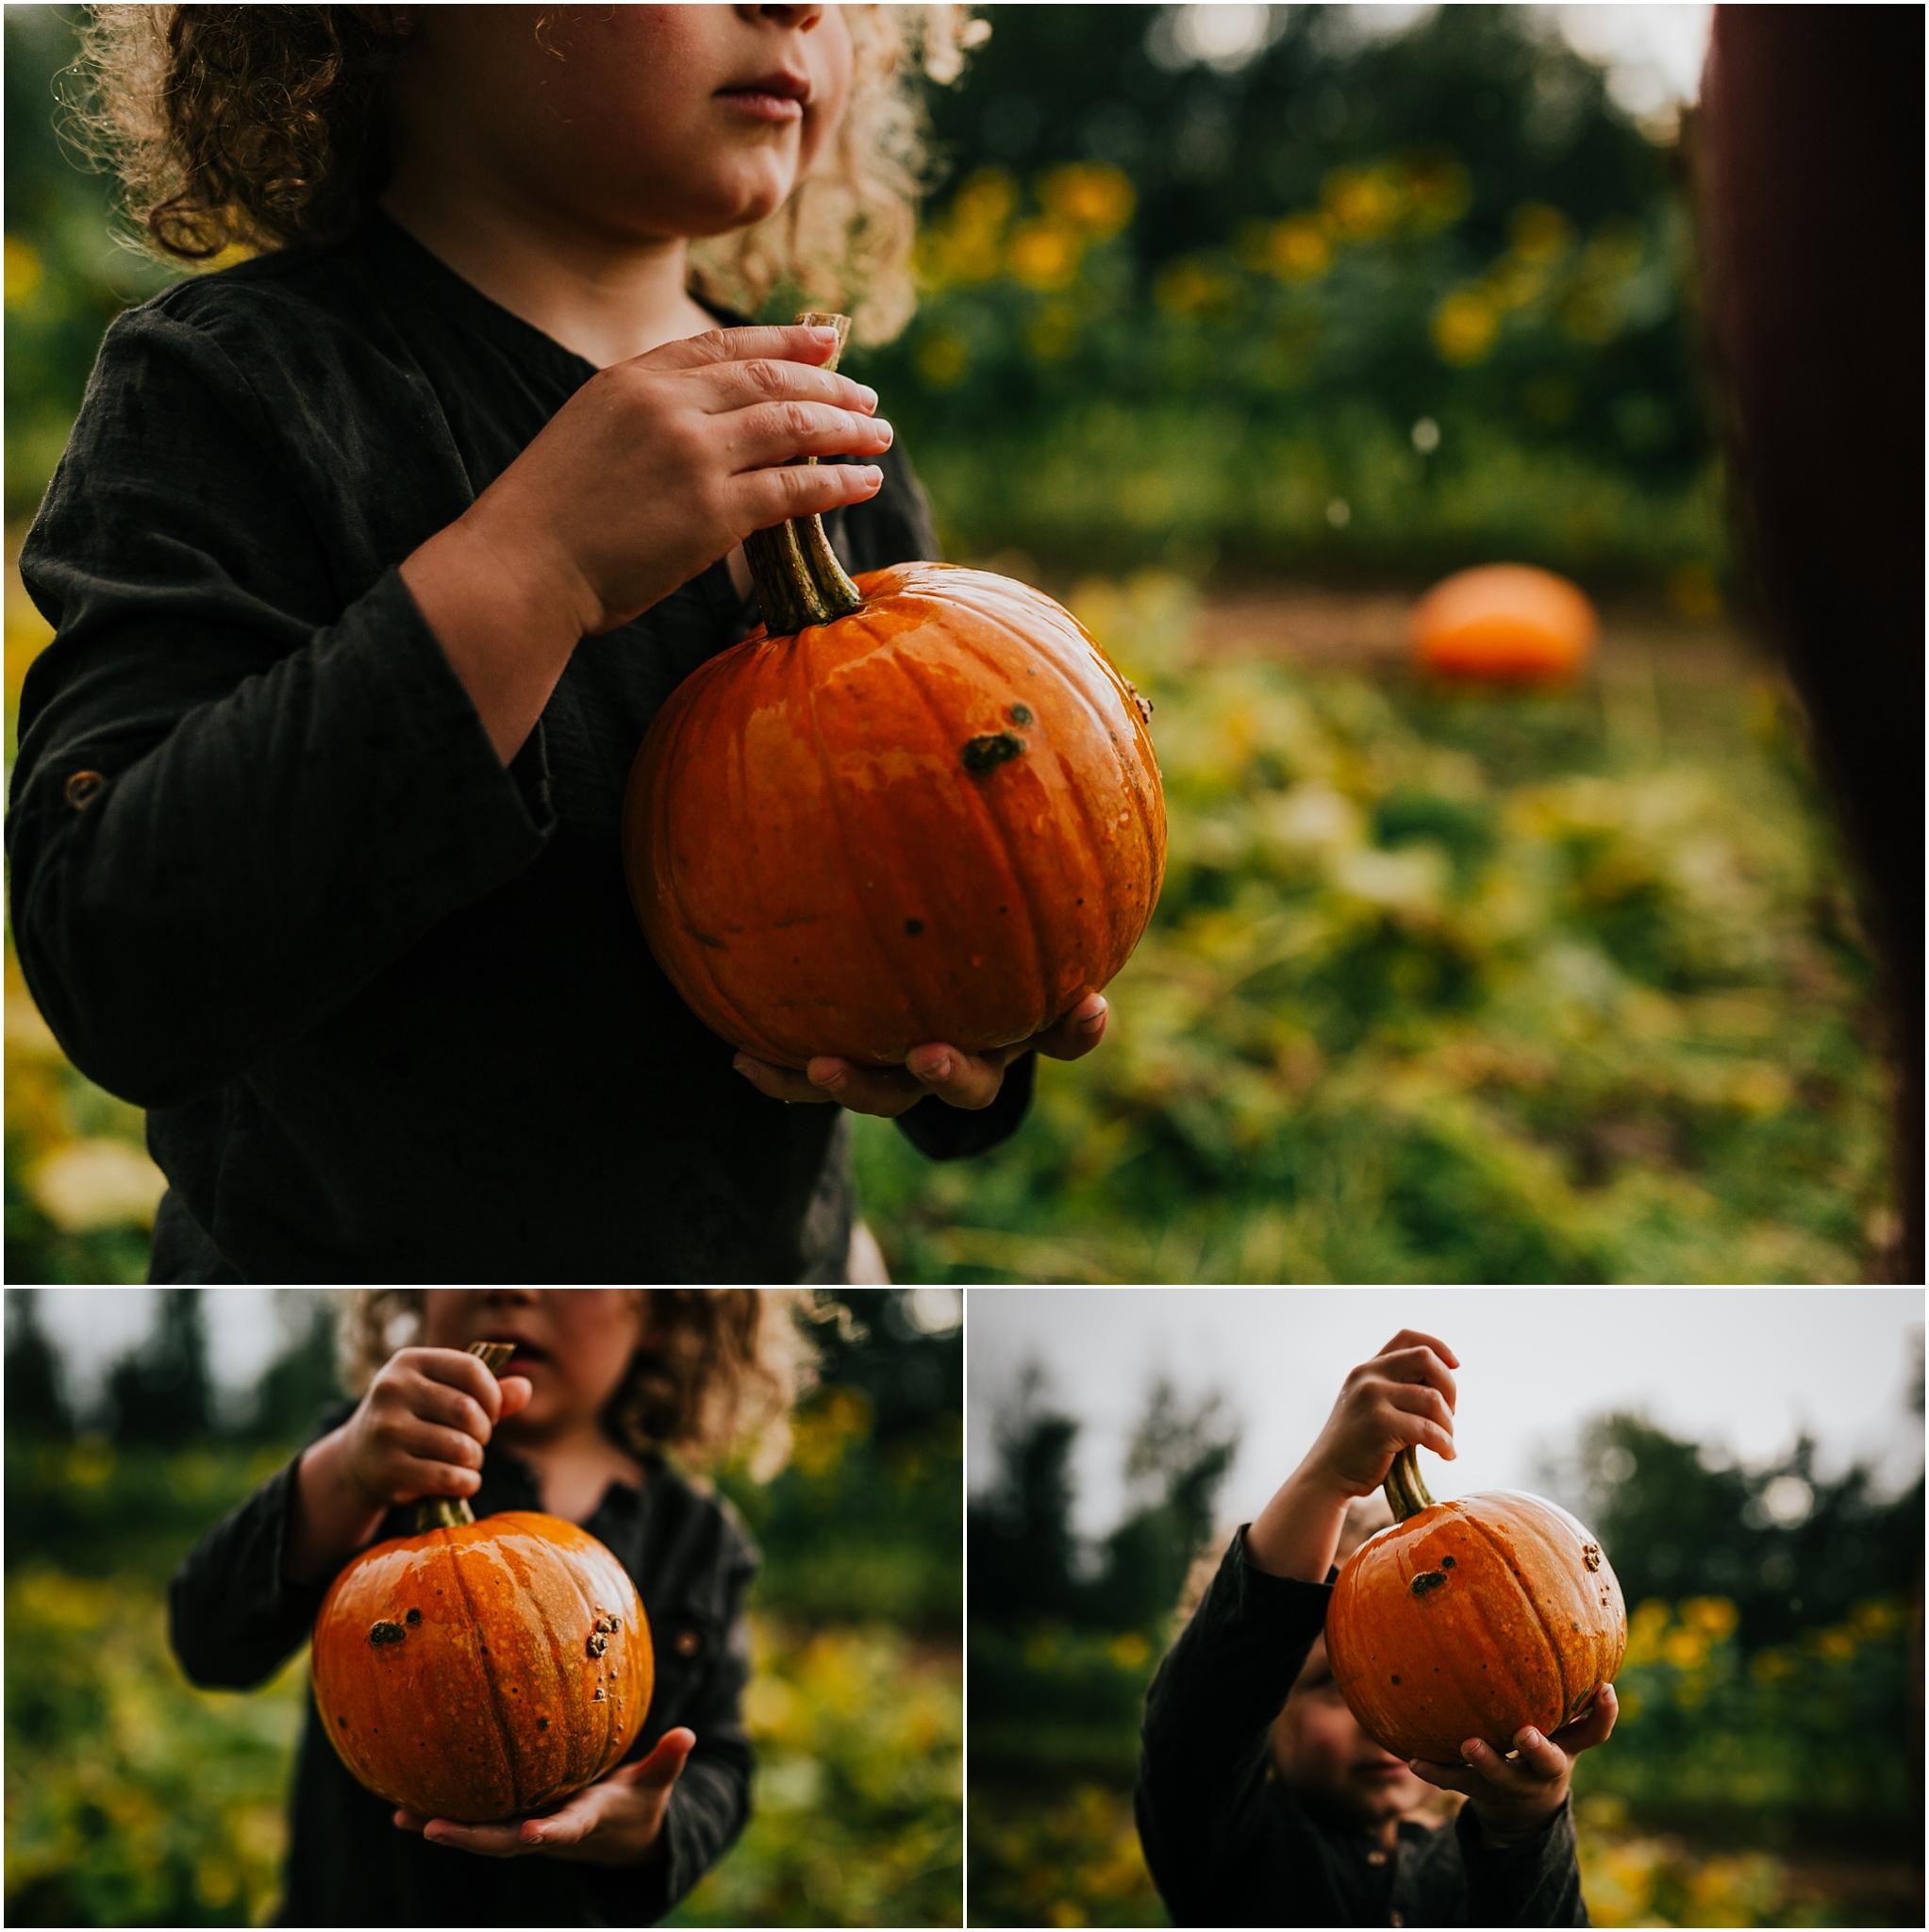 Treelines Photography - Edmonton Photographer - Edmonton Lifestyle Photographer - Pumpkin Picking Edmonton - Pumpkin Patch - Fall Activities